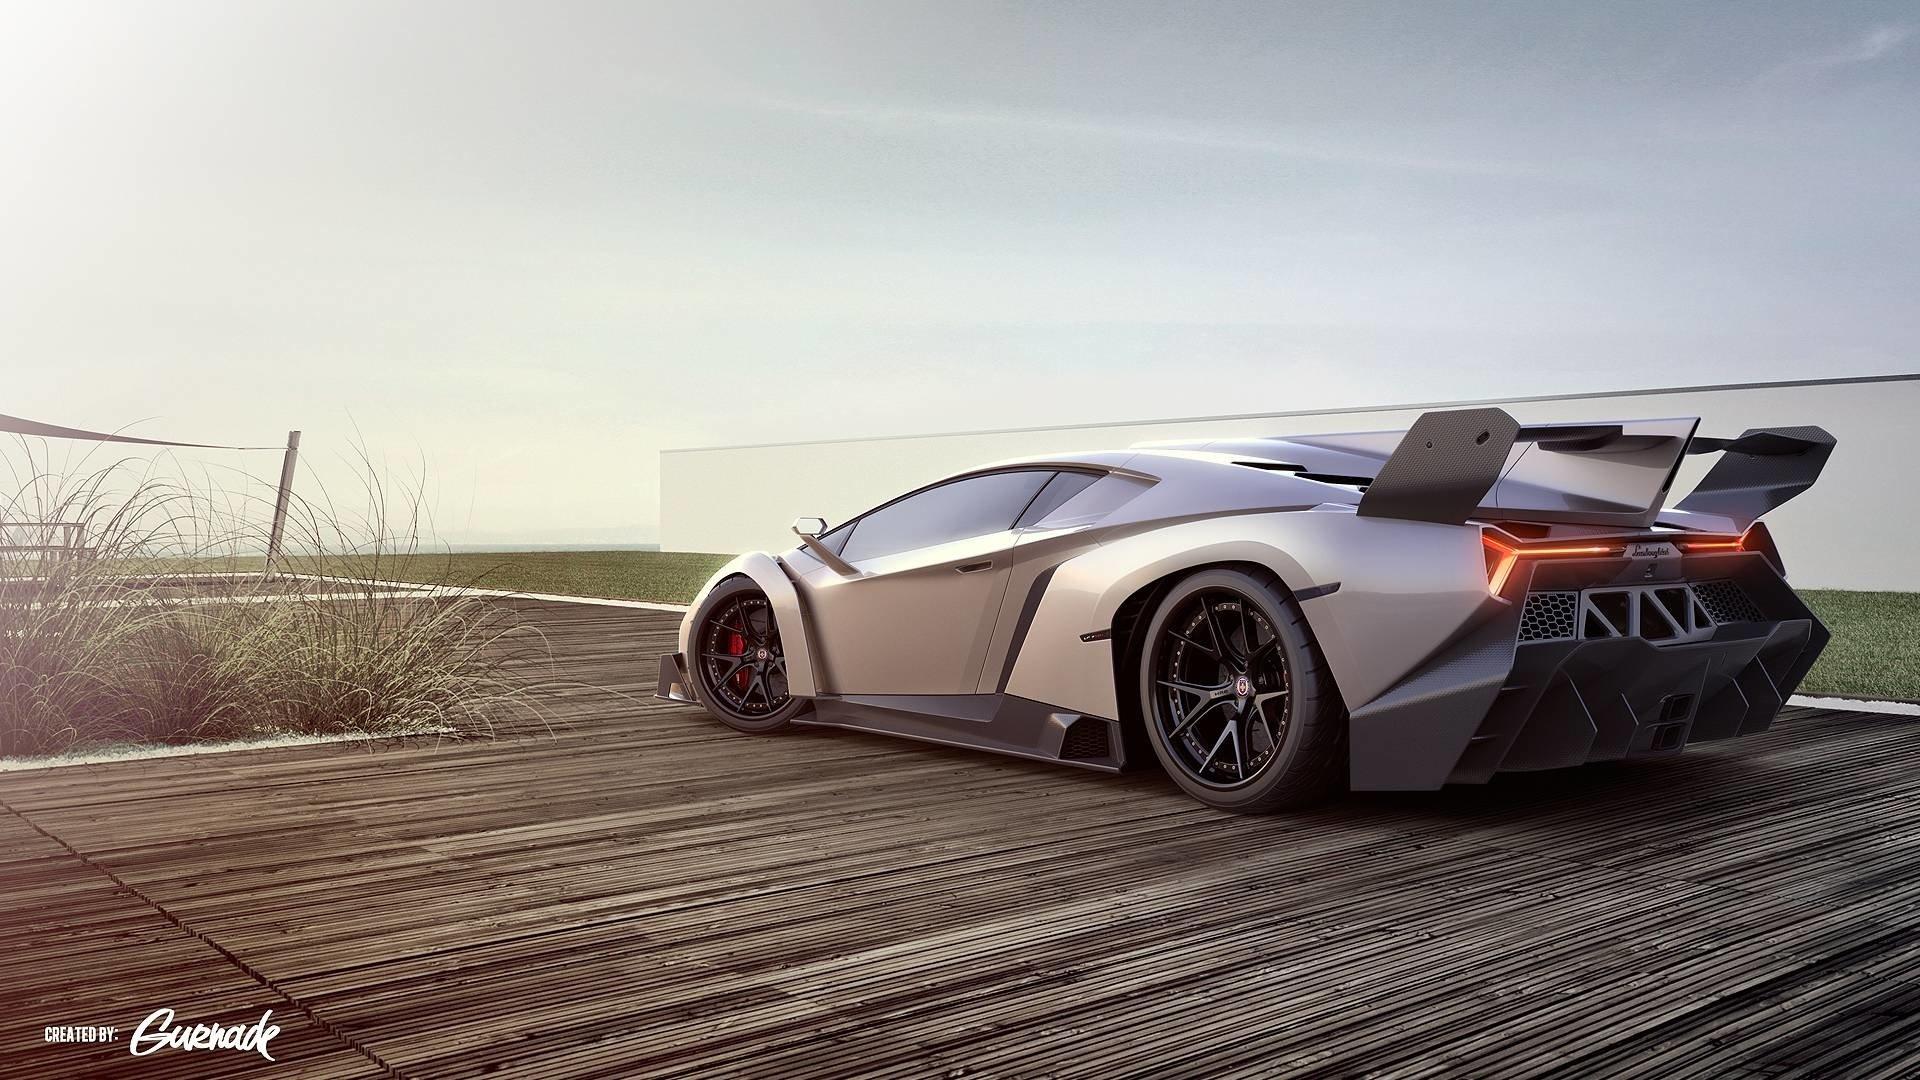 Lamborghini Veneno Full HD Wallpaper And Background Image